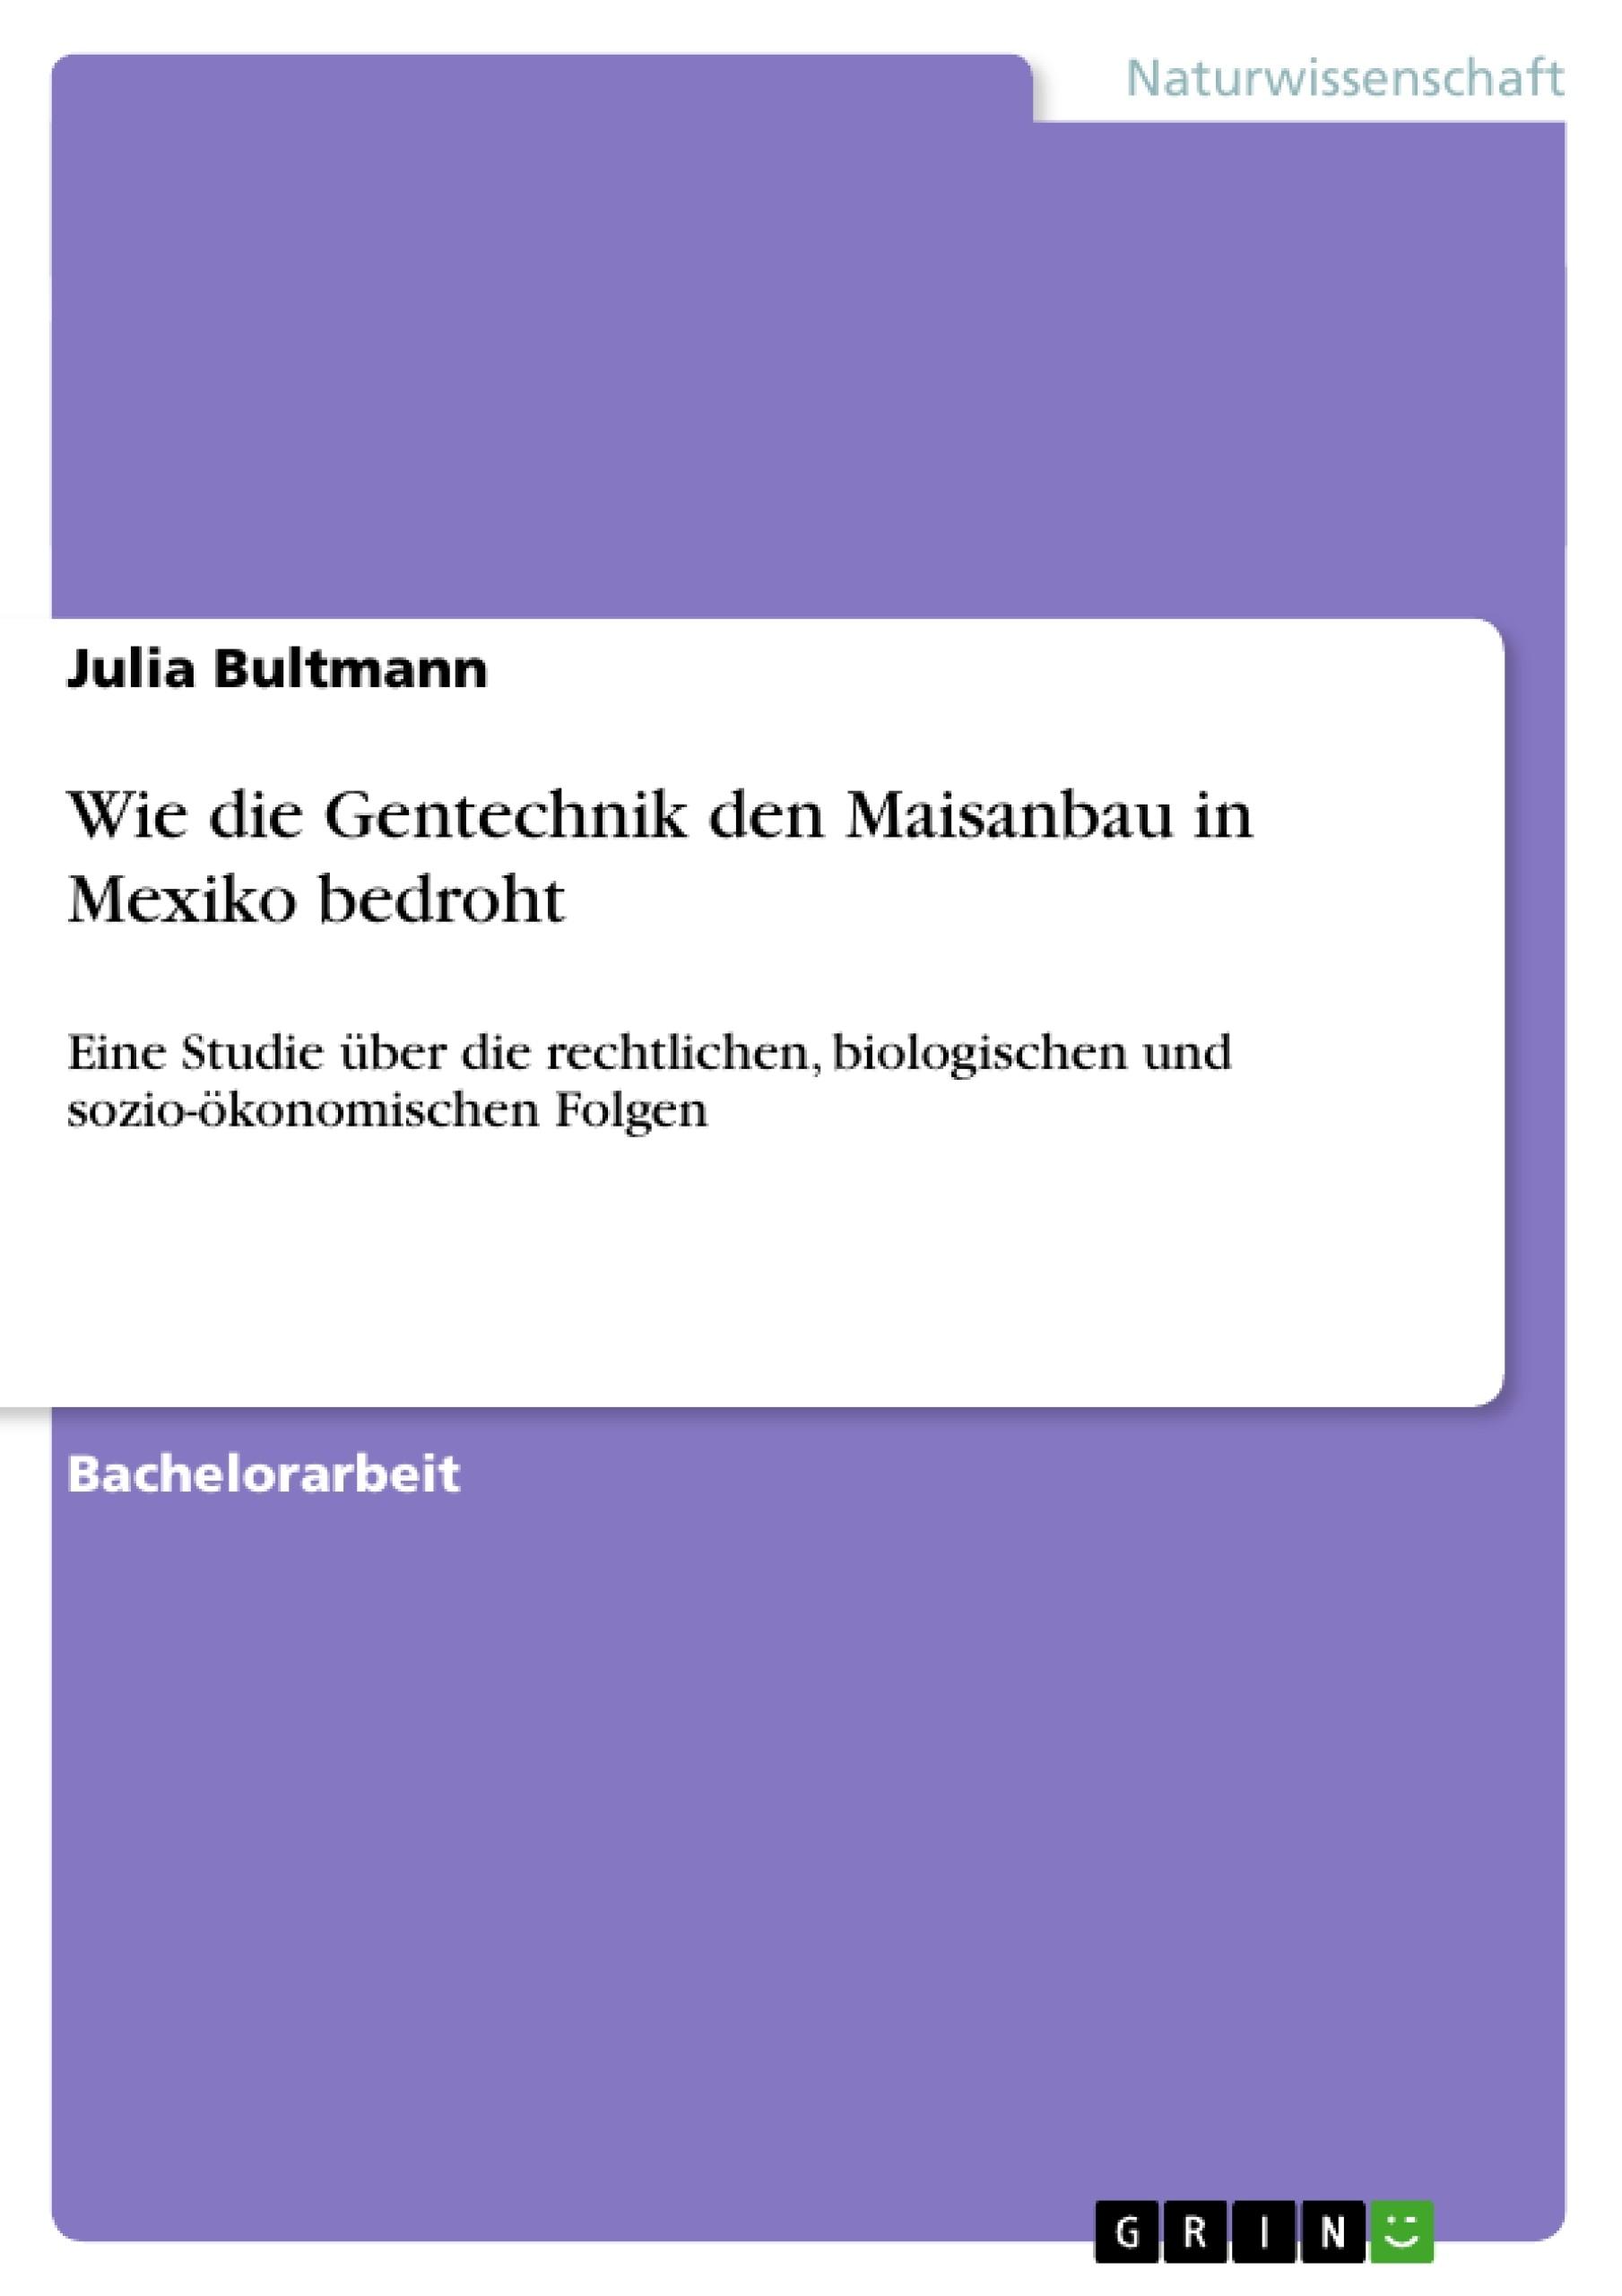 Titel: Wie die Gentechnik den Maisanbau in Mexiko bedroht